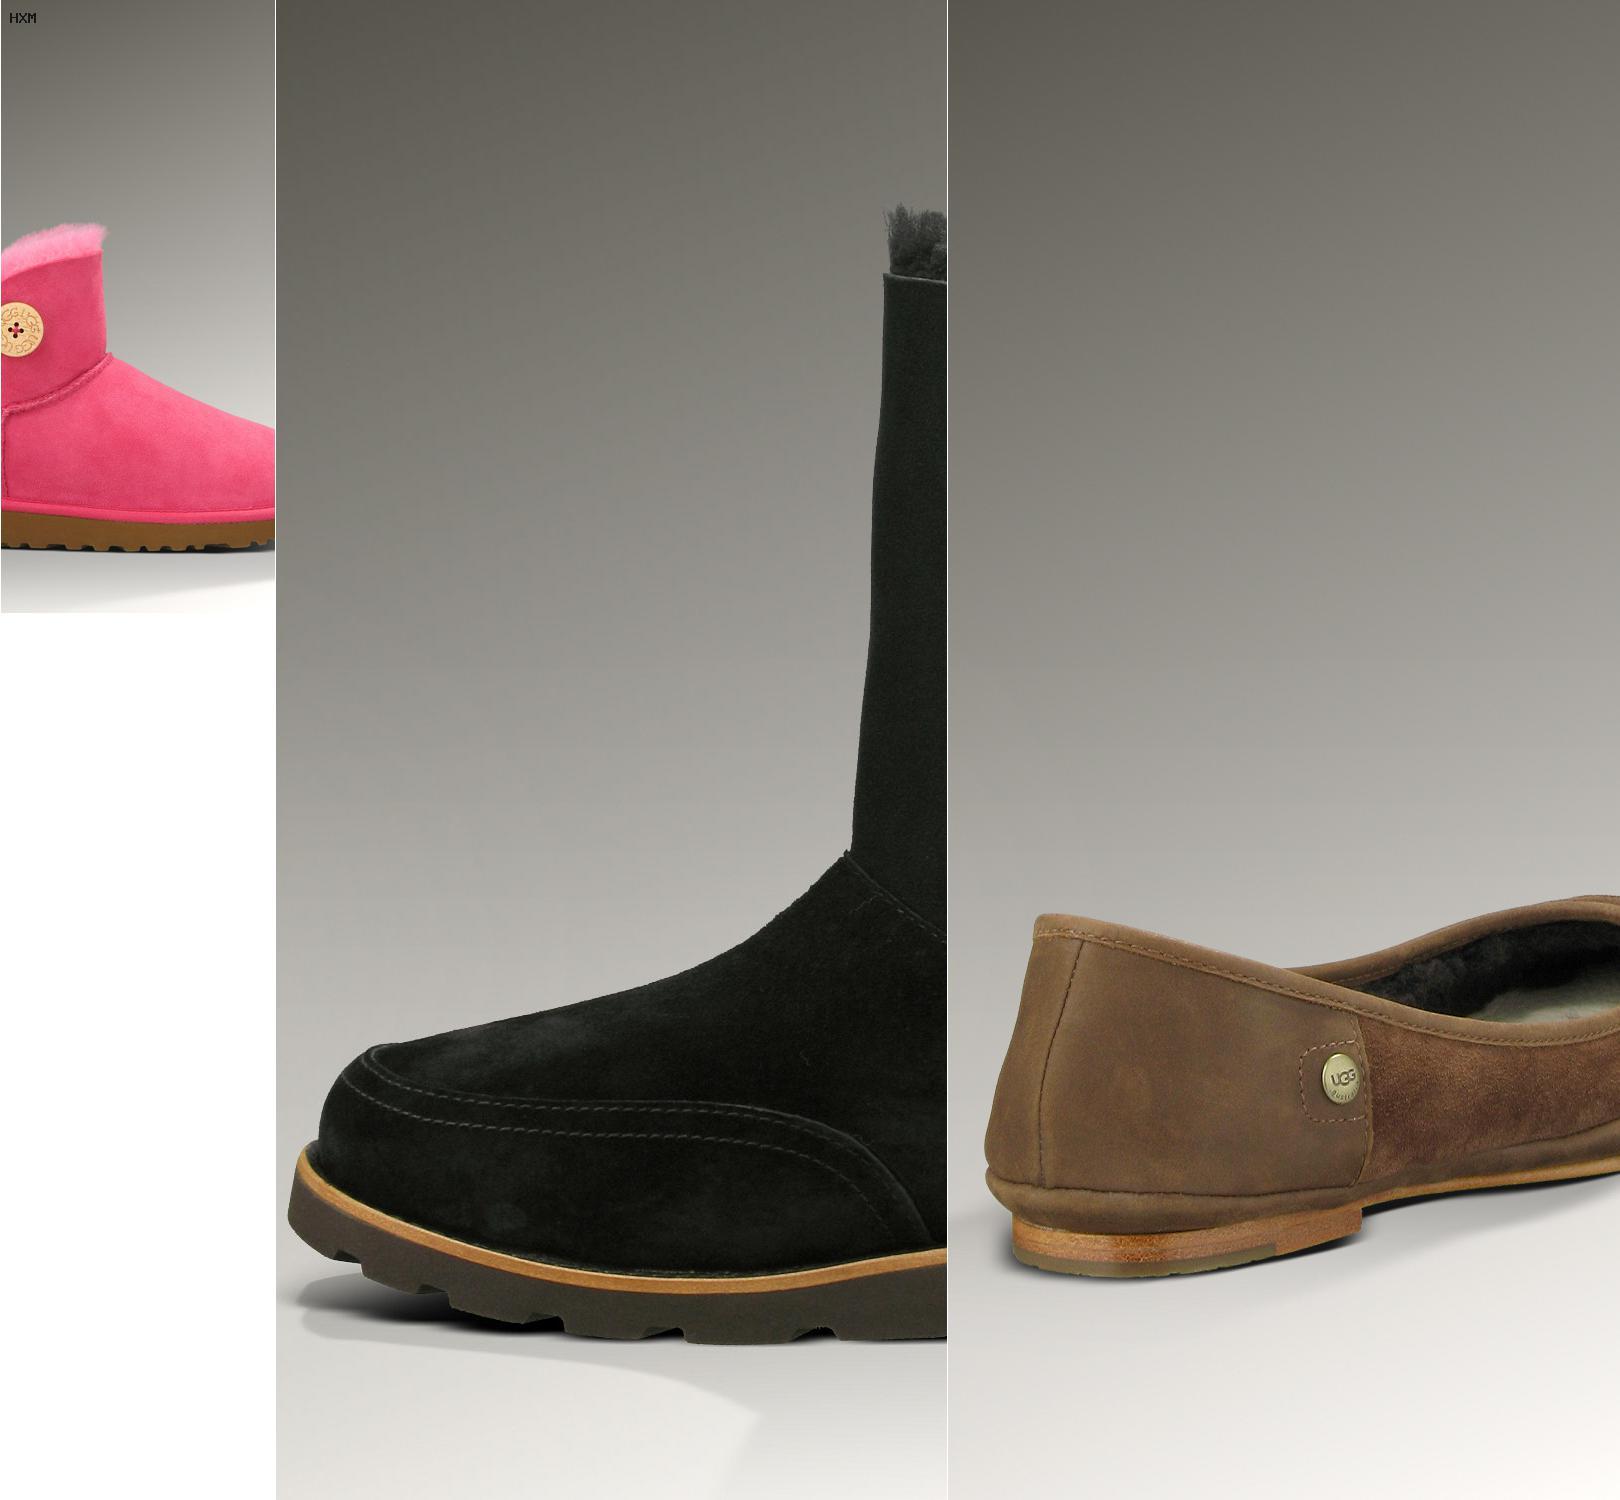 donde comprar botas ugg australia en barcelona